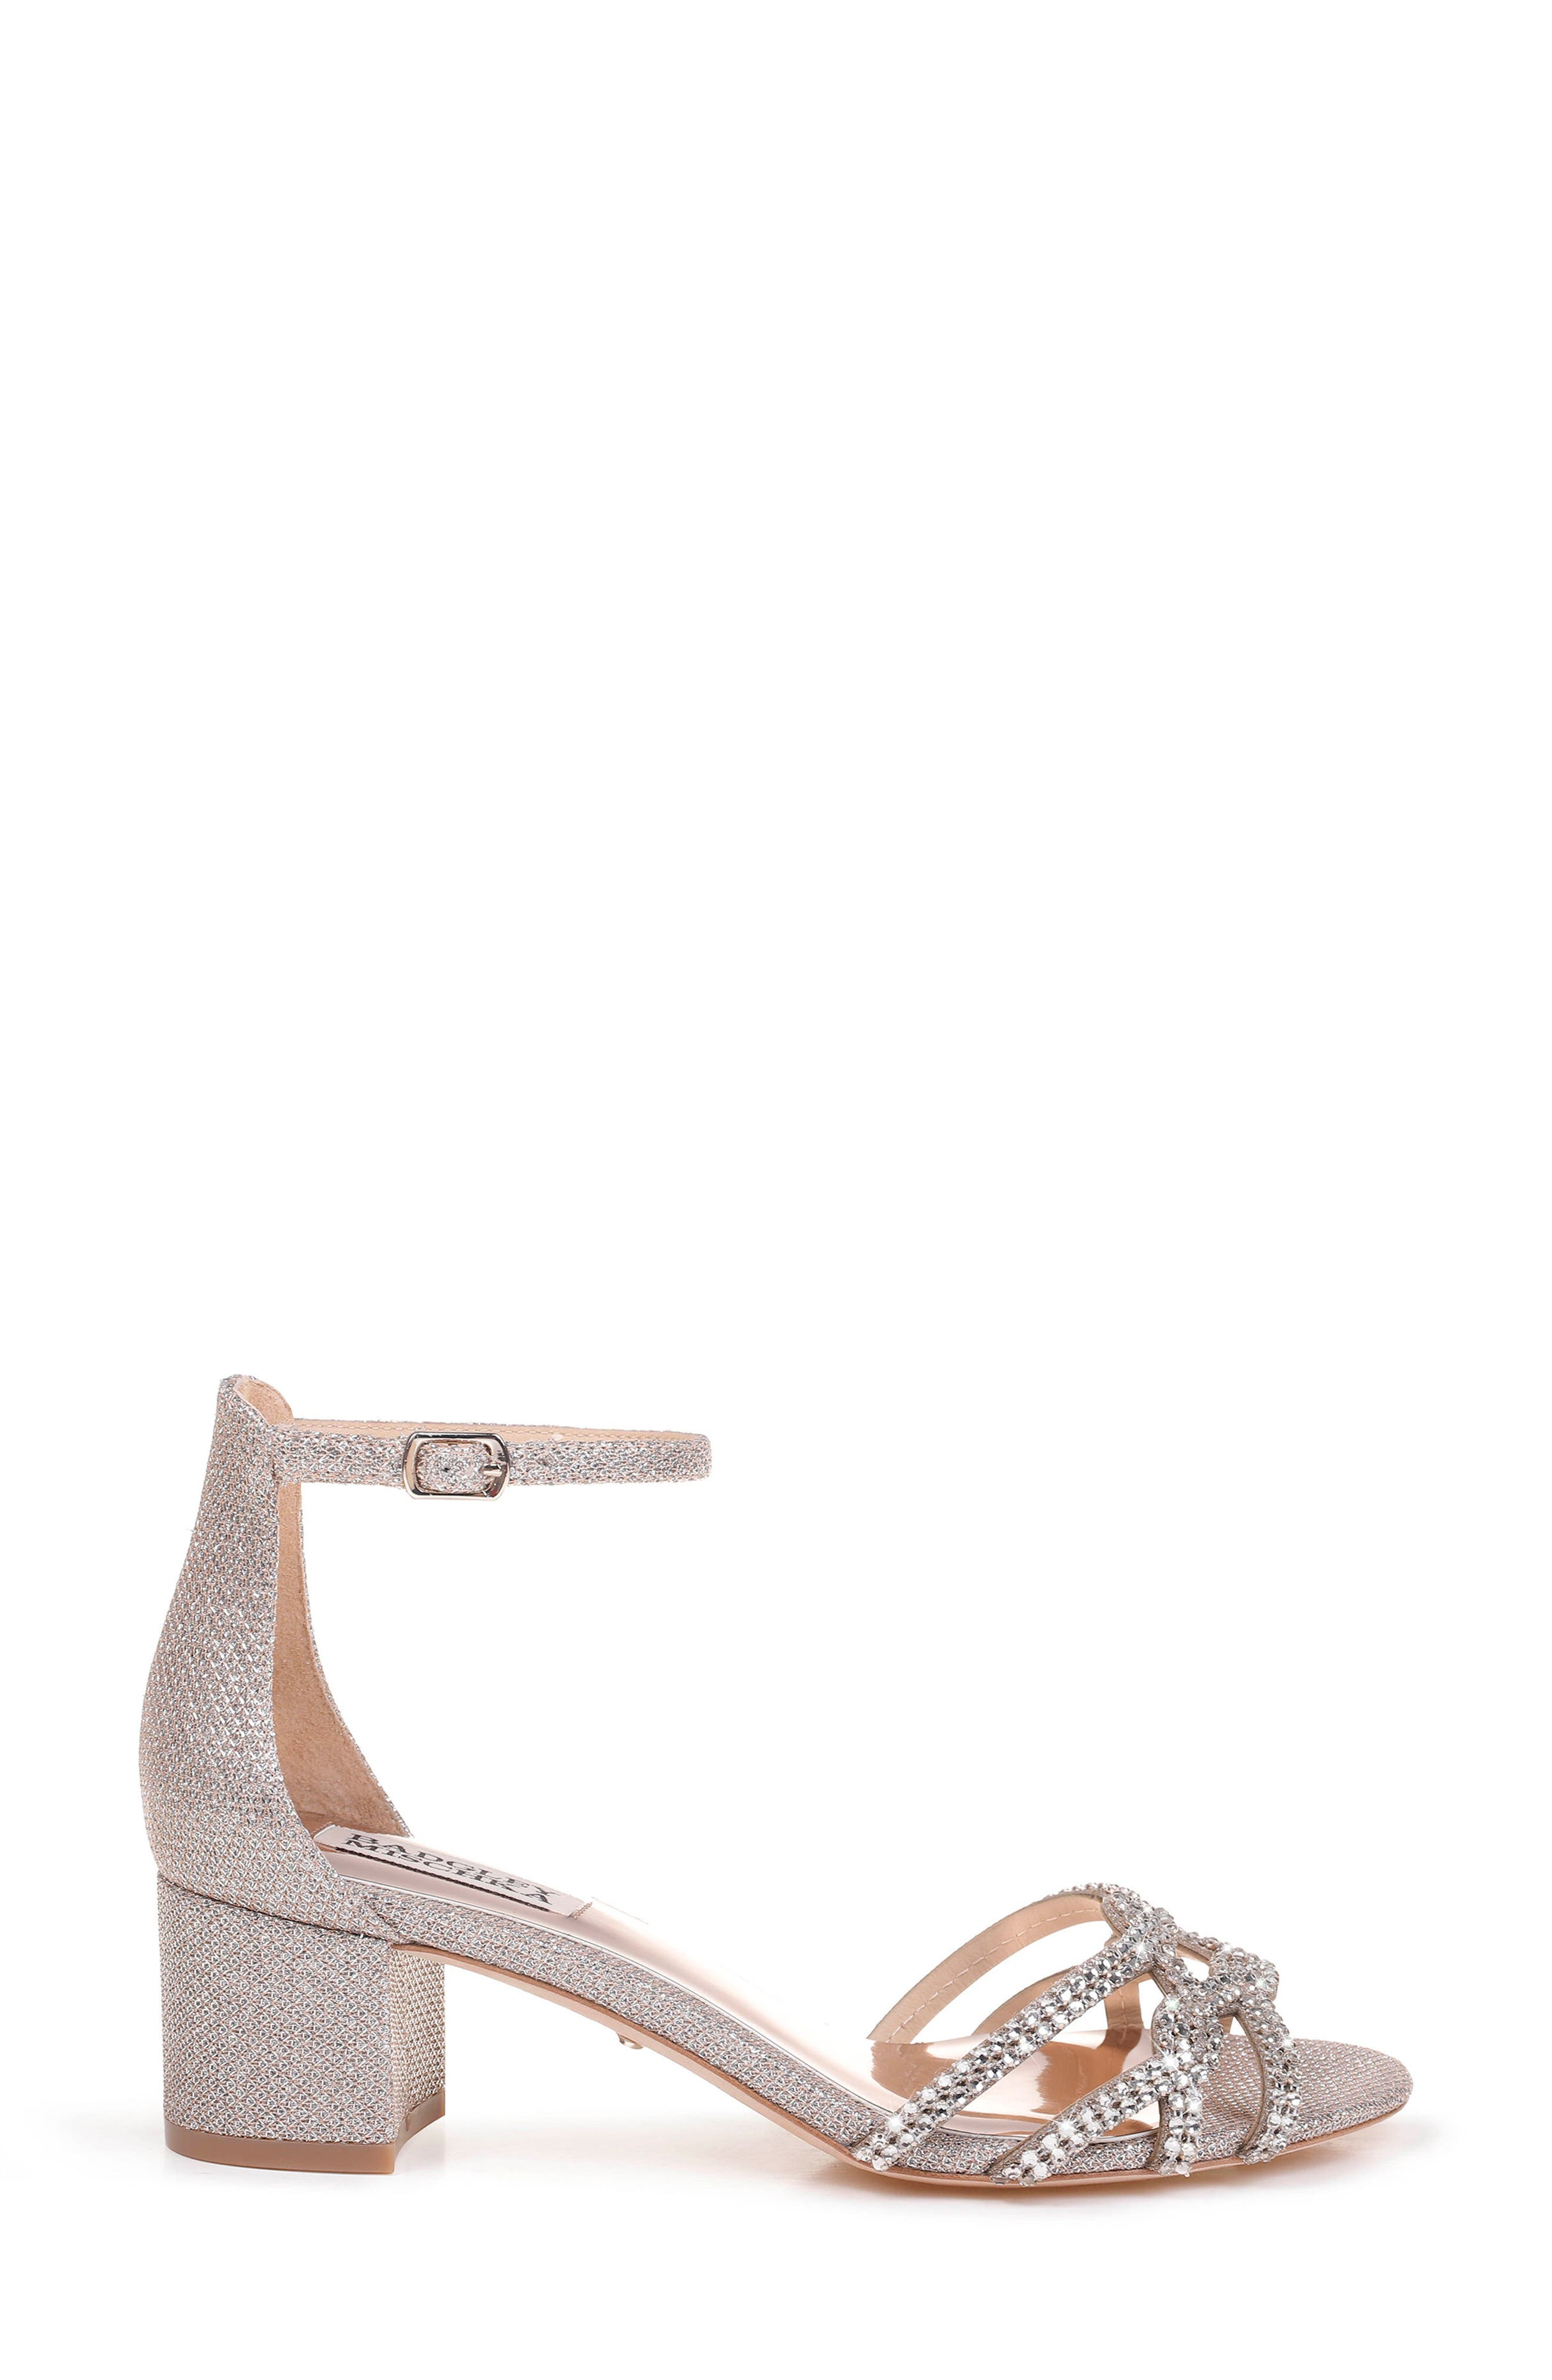 Alternate Image 3  - Badgley Mischka Sonya Block Heel Sandal (Women)